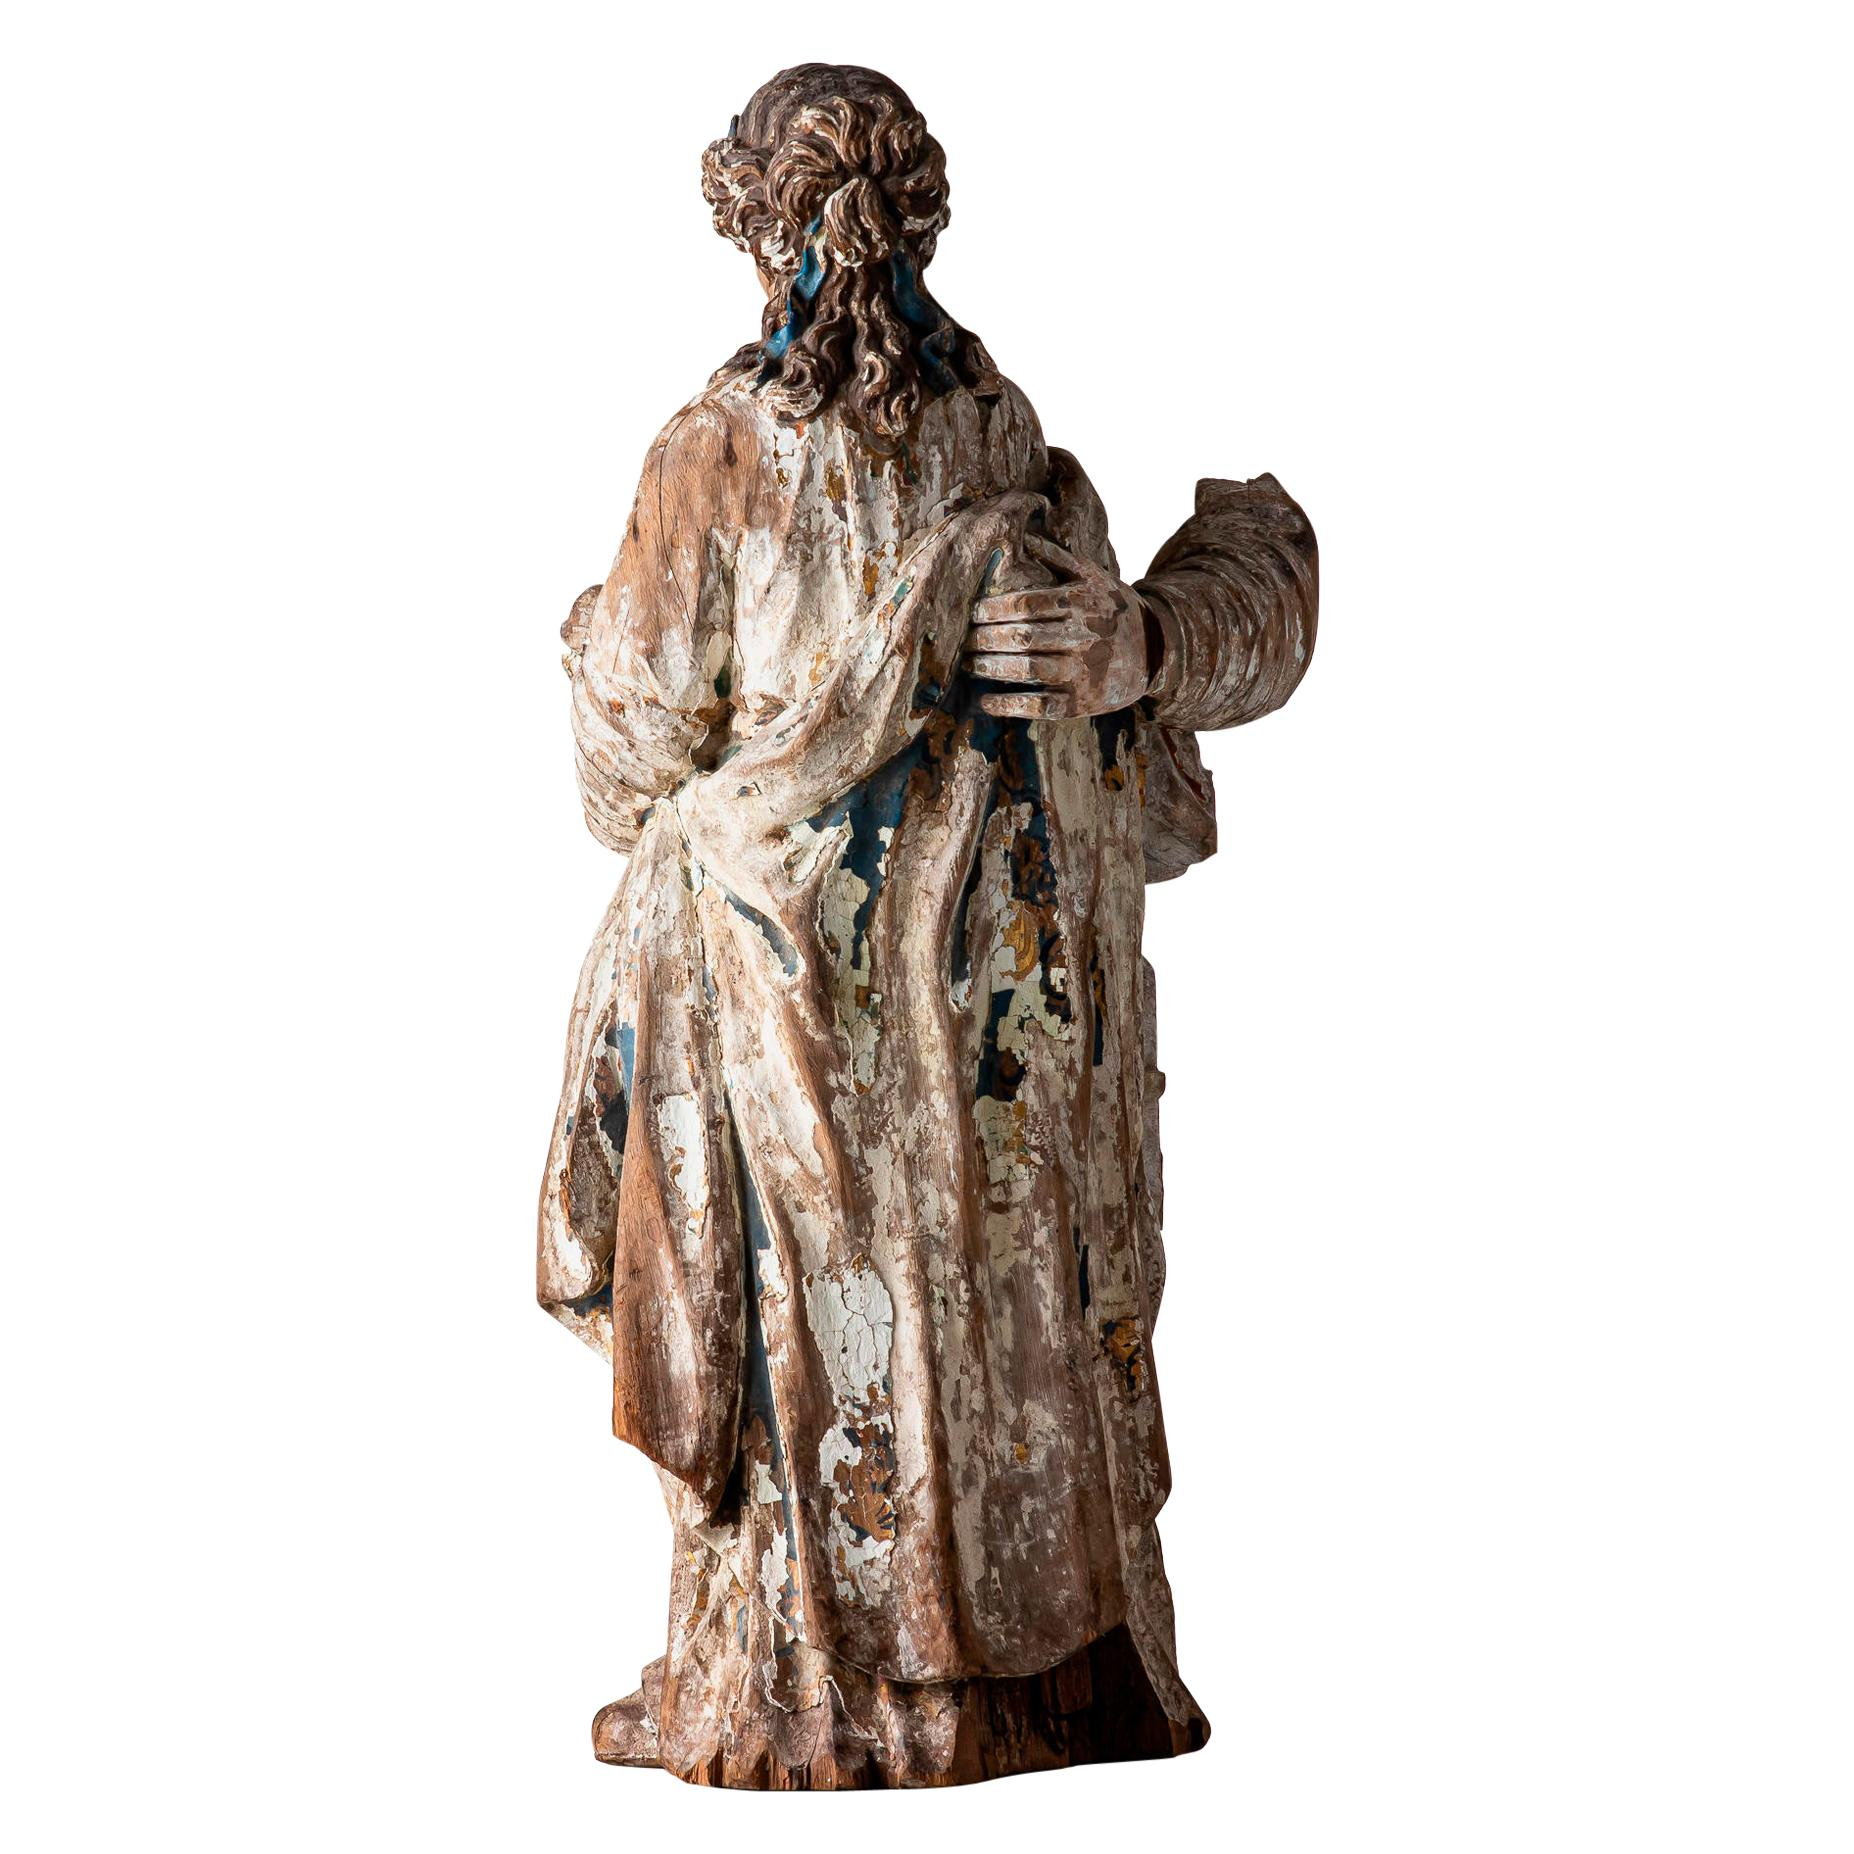 18th Century, Baroque, Italian School, Sculpture Carved in Oak